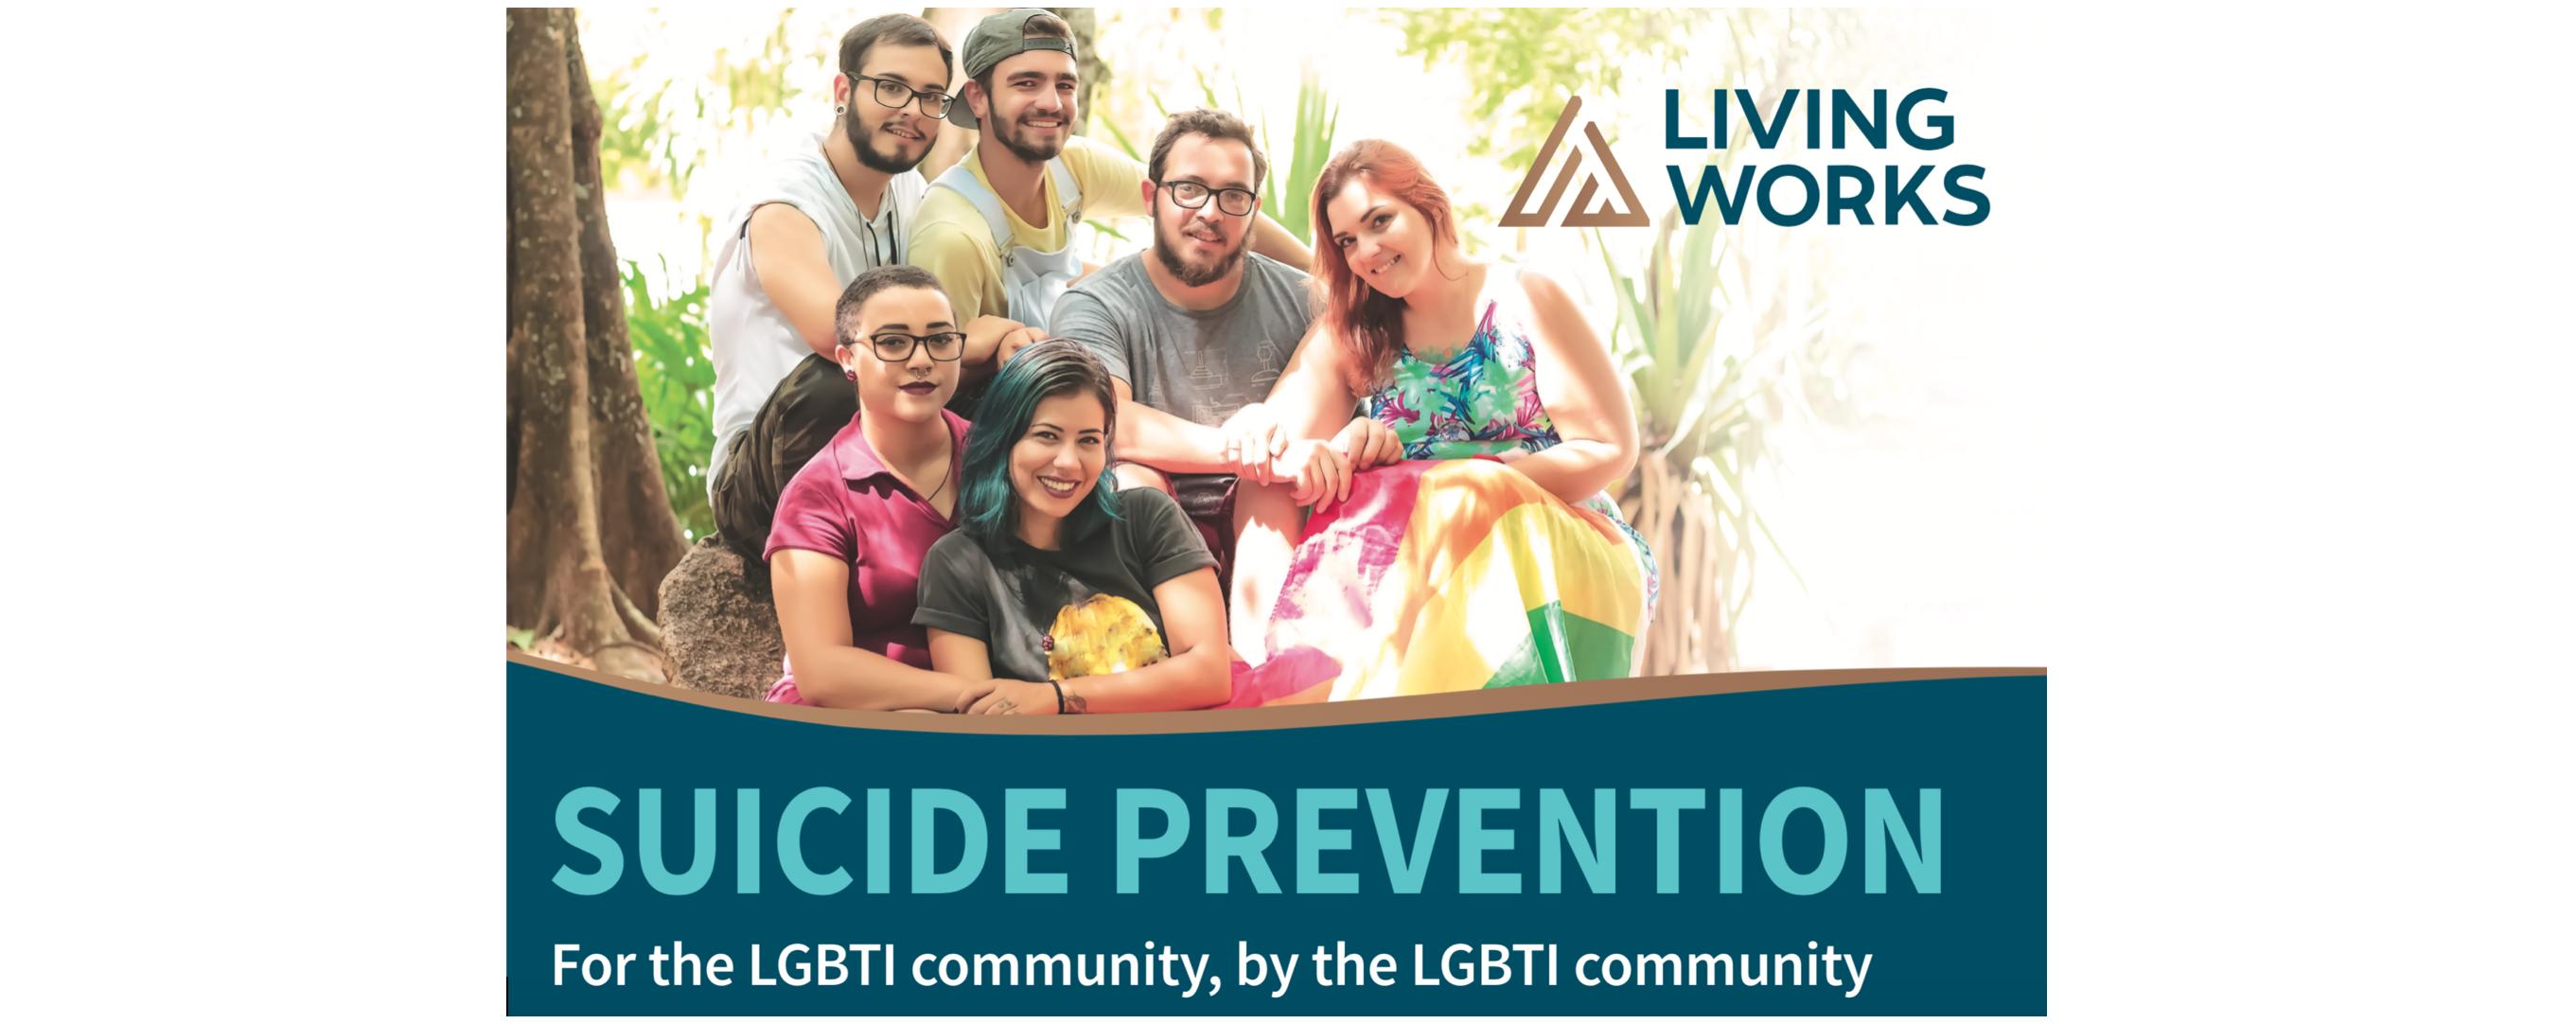 ASIST Suicide Intervention Skills Training for LGBTIQ Communities